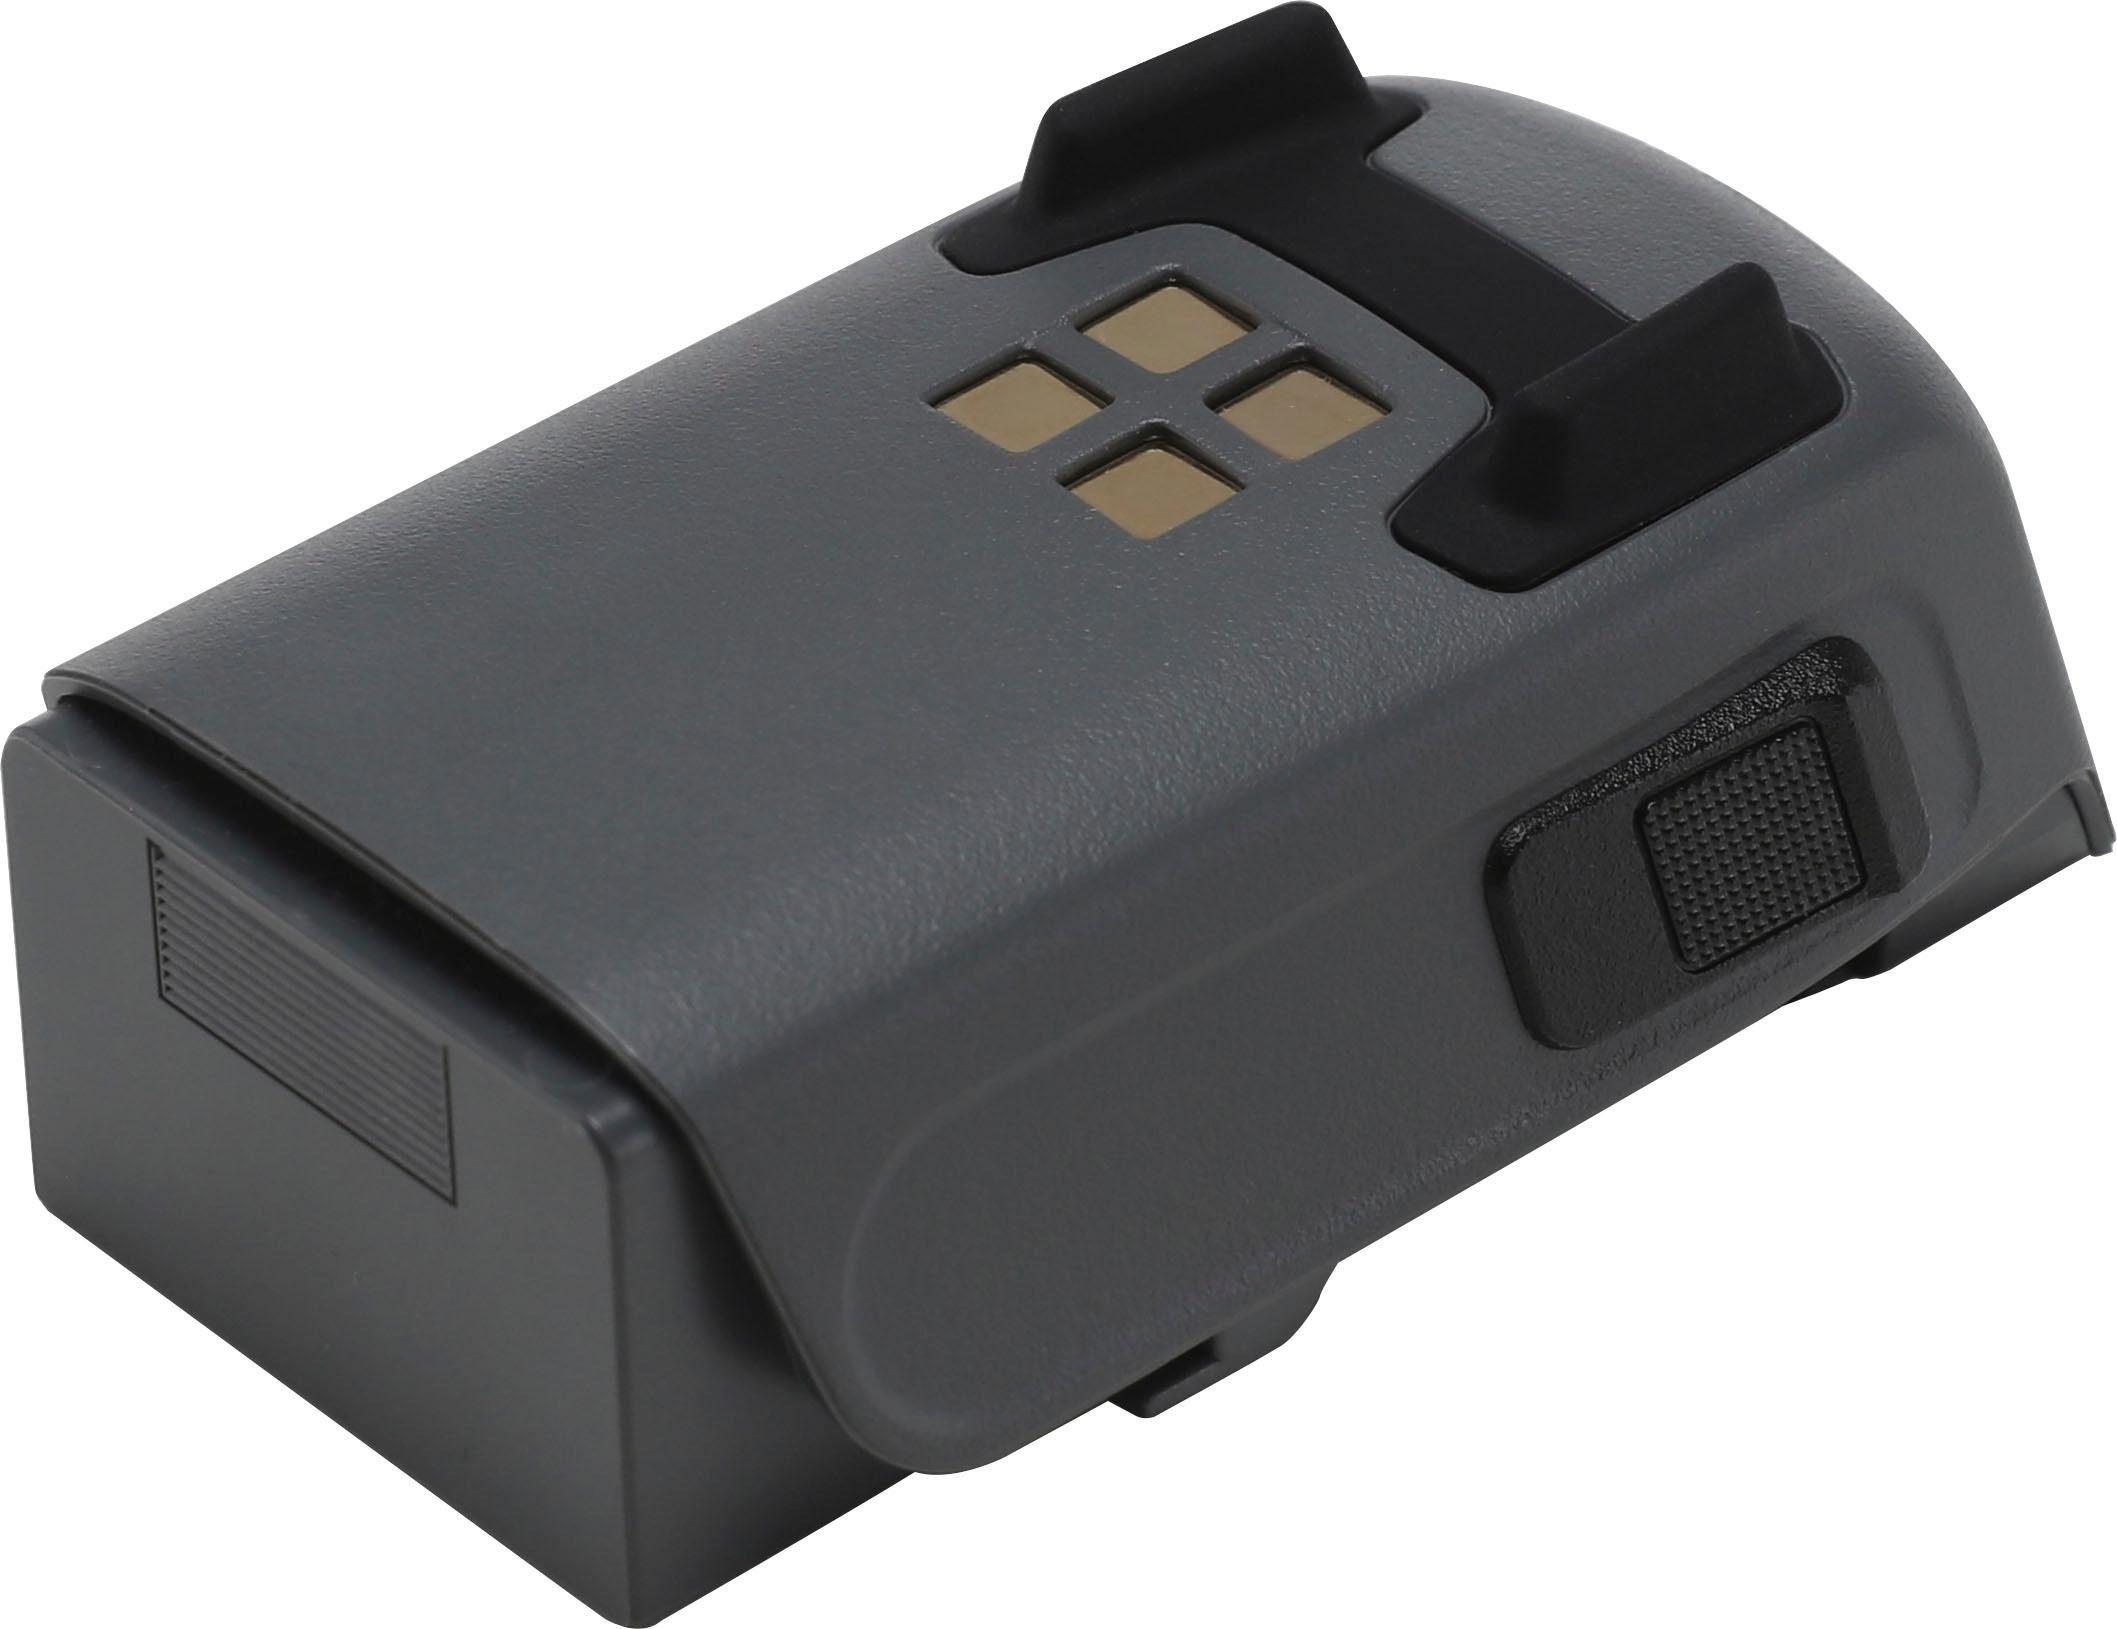 dji »Spark (P03)« Drohnen-Akku 1480 mAh (11,4 V)